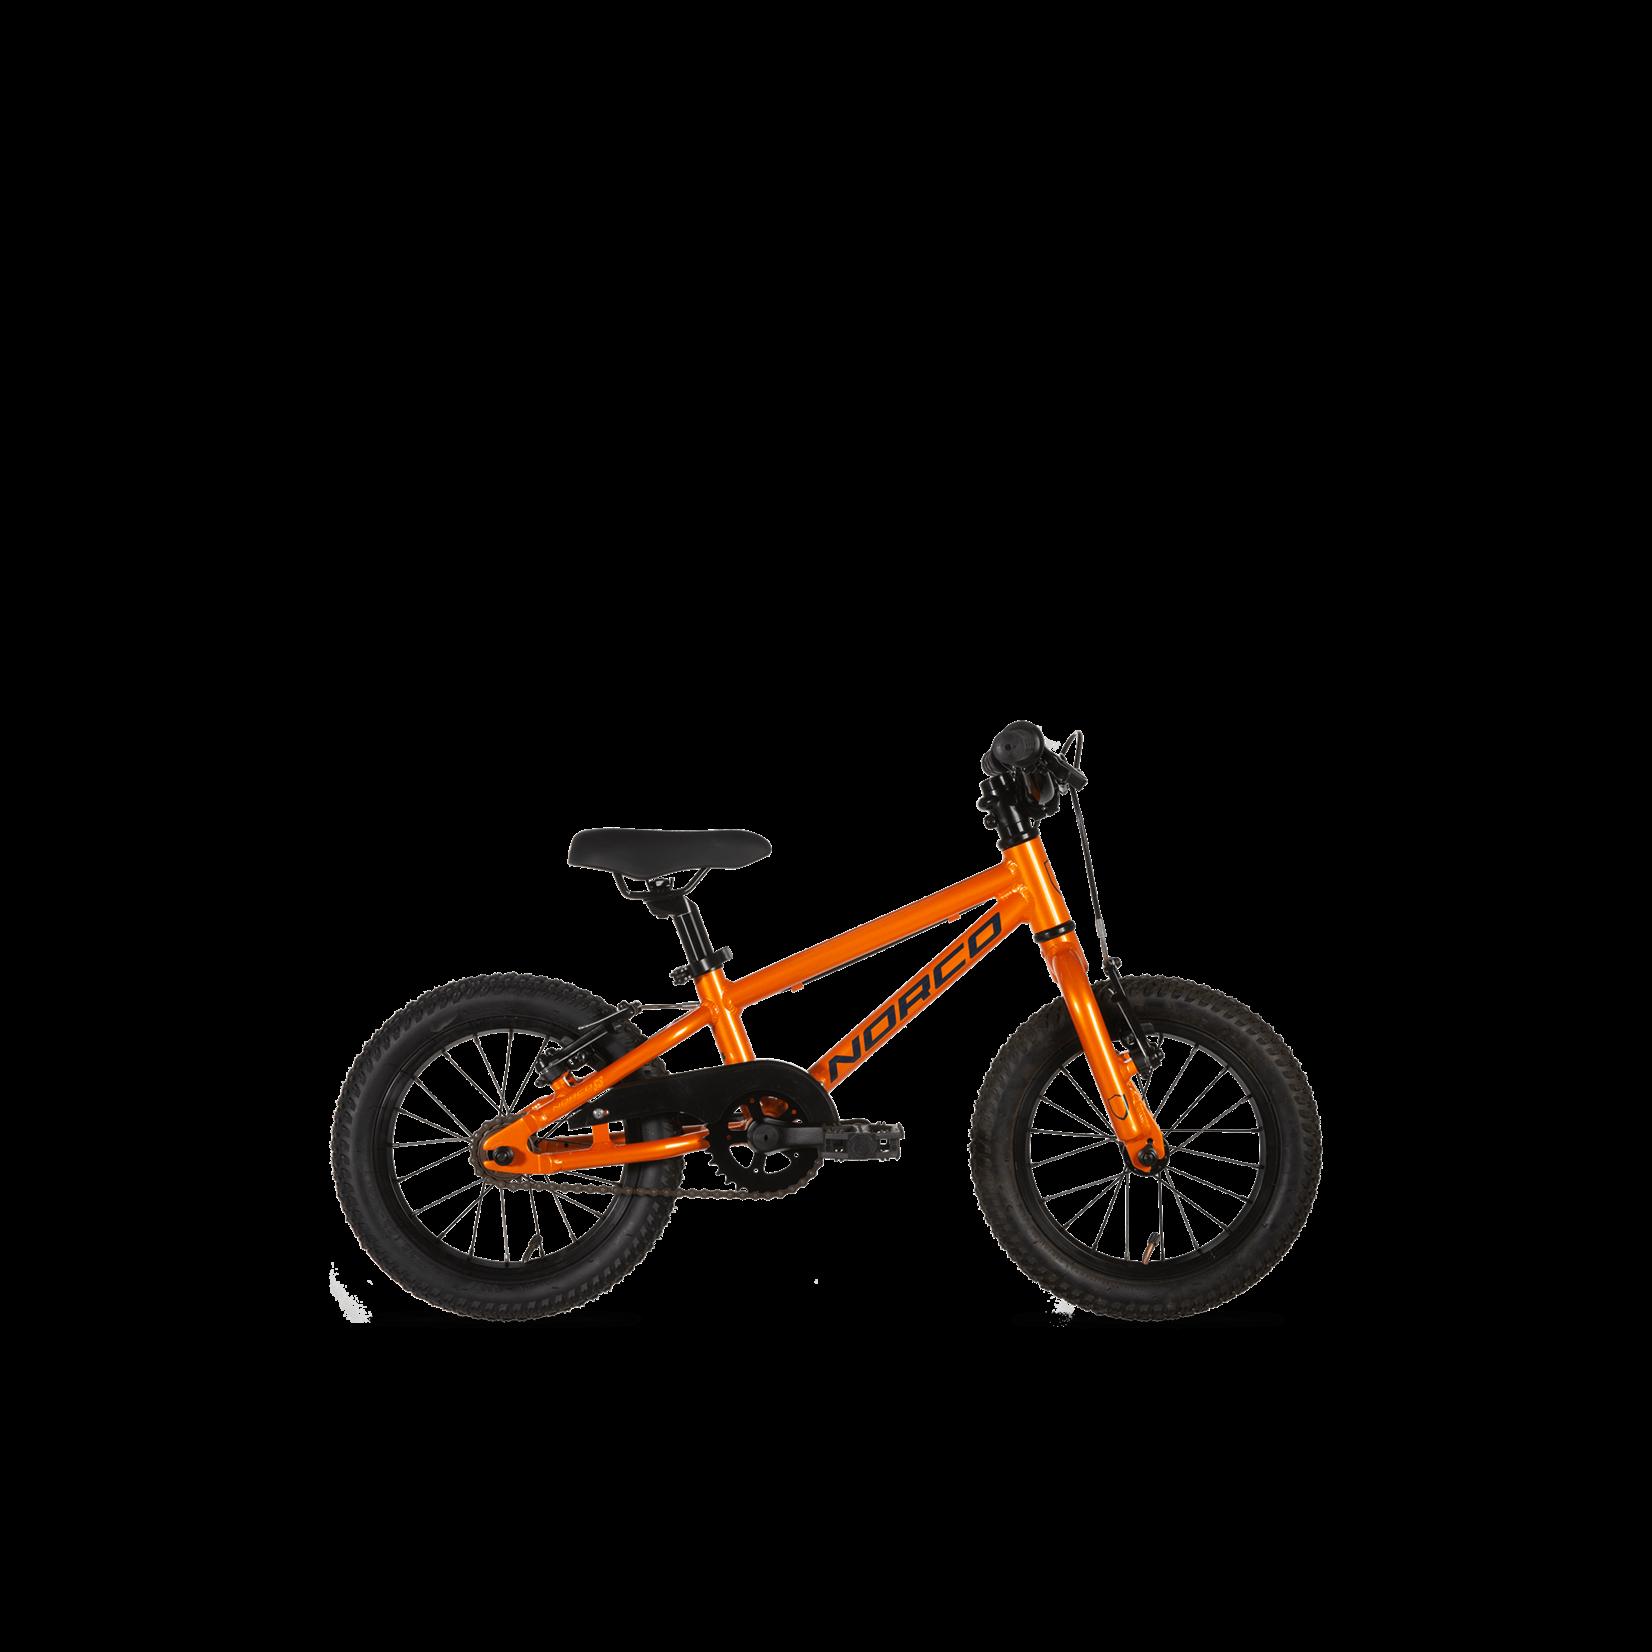 Norco 2021 Norco Roller 14